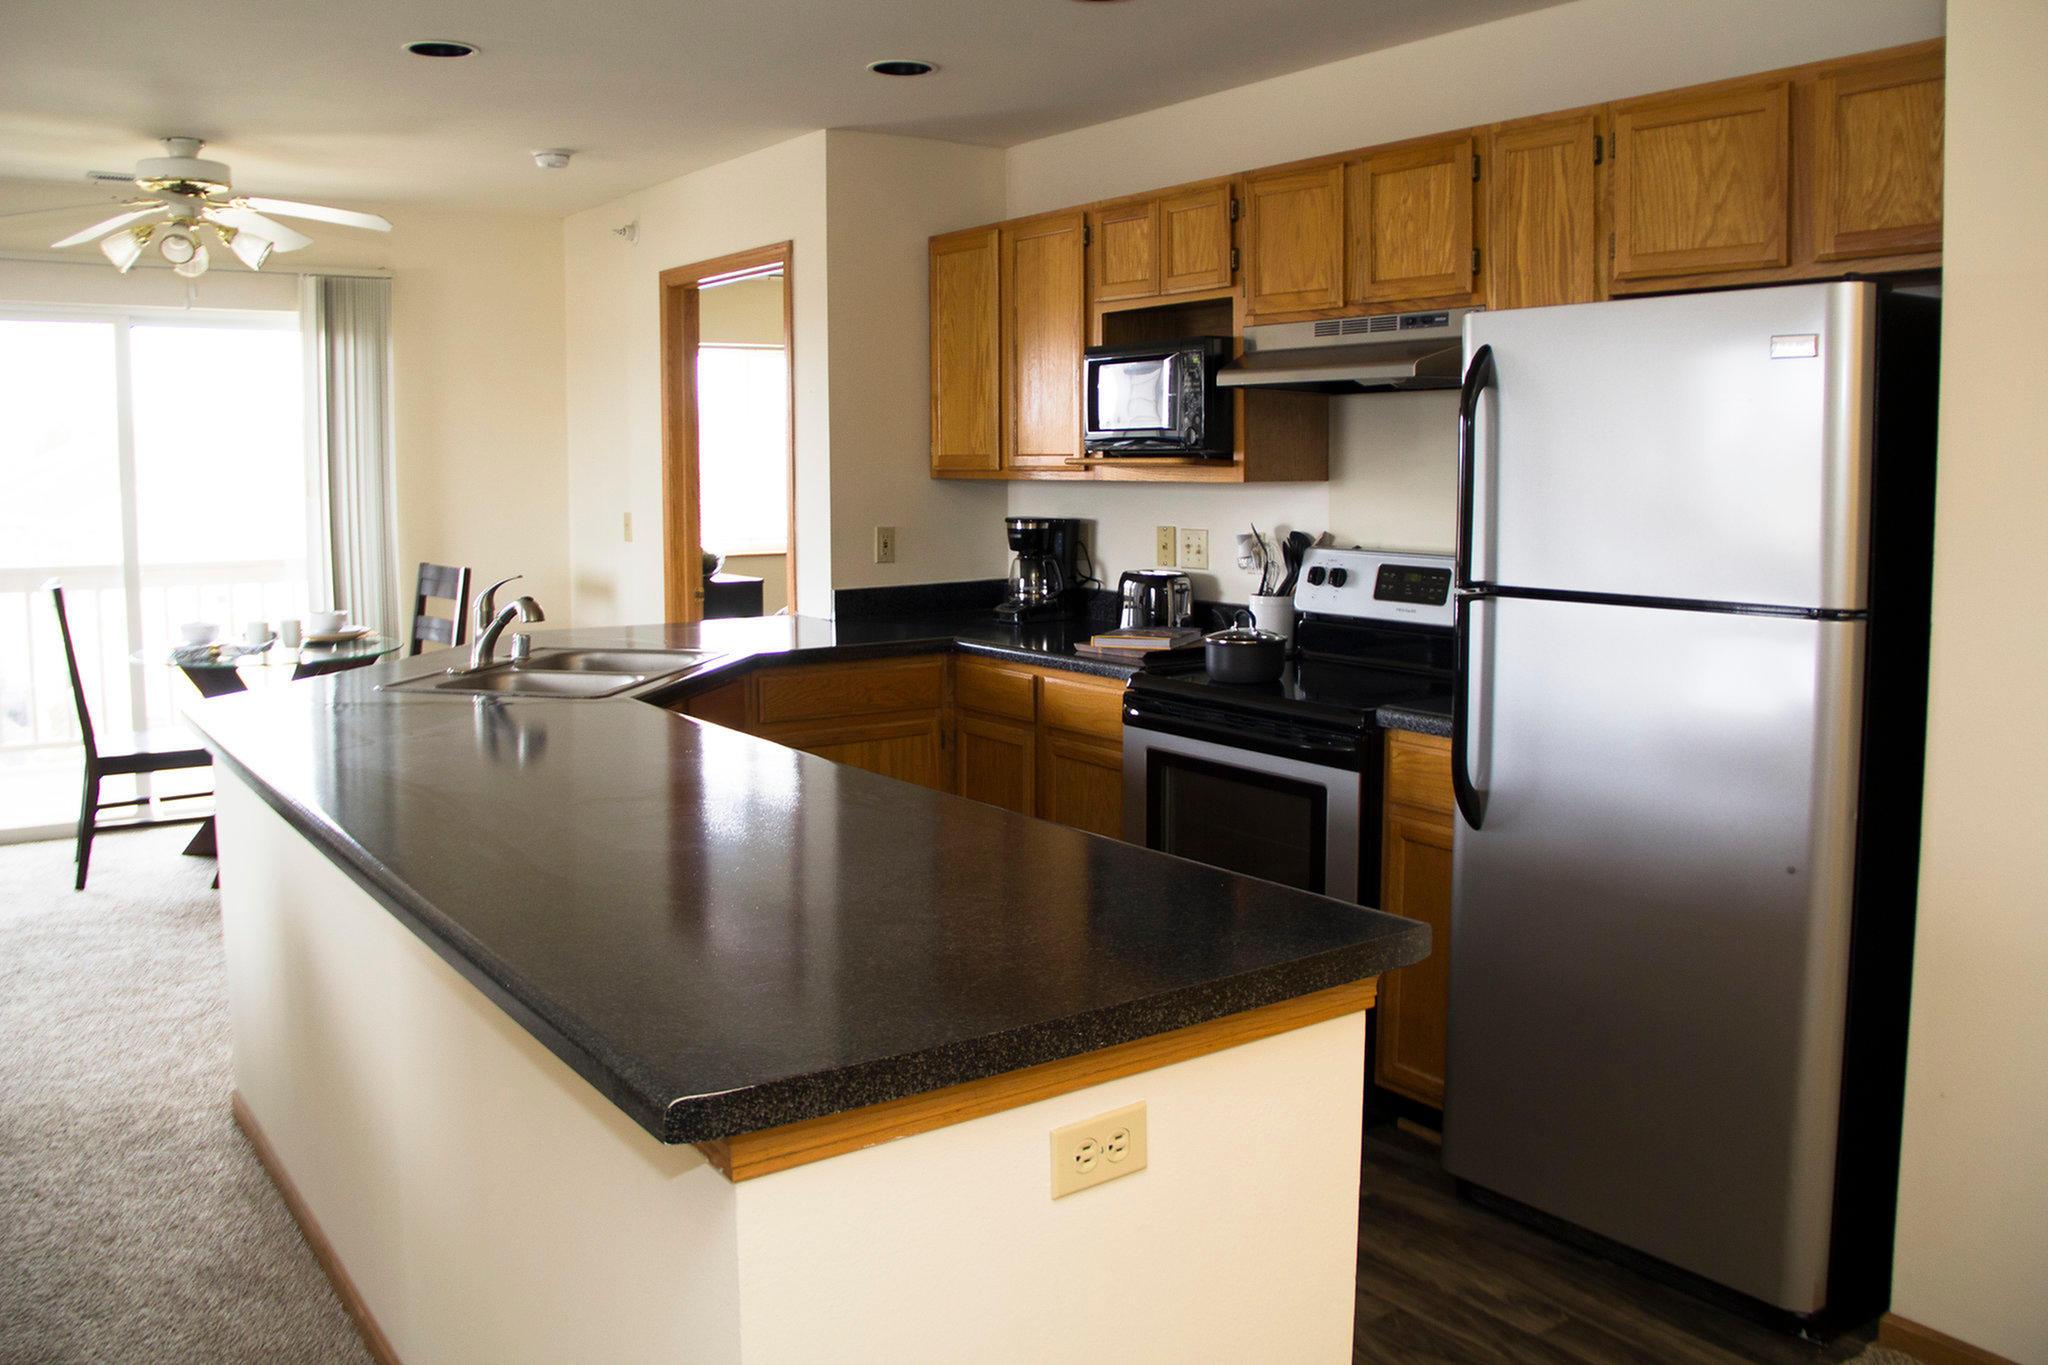 Saddle Brook Apartments image 8